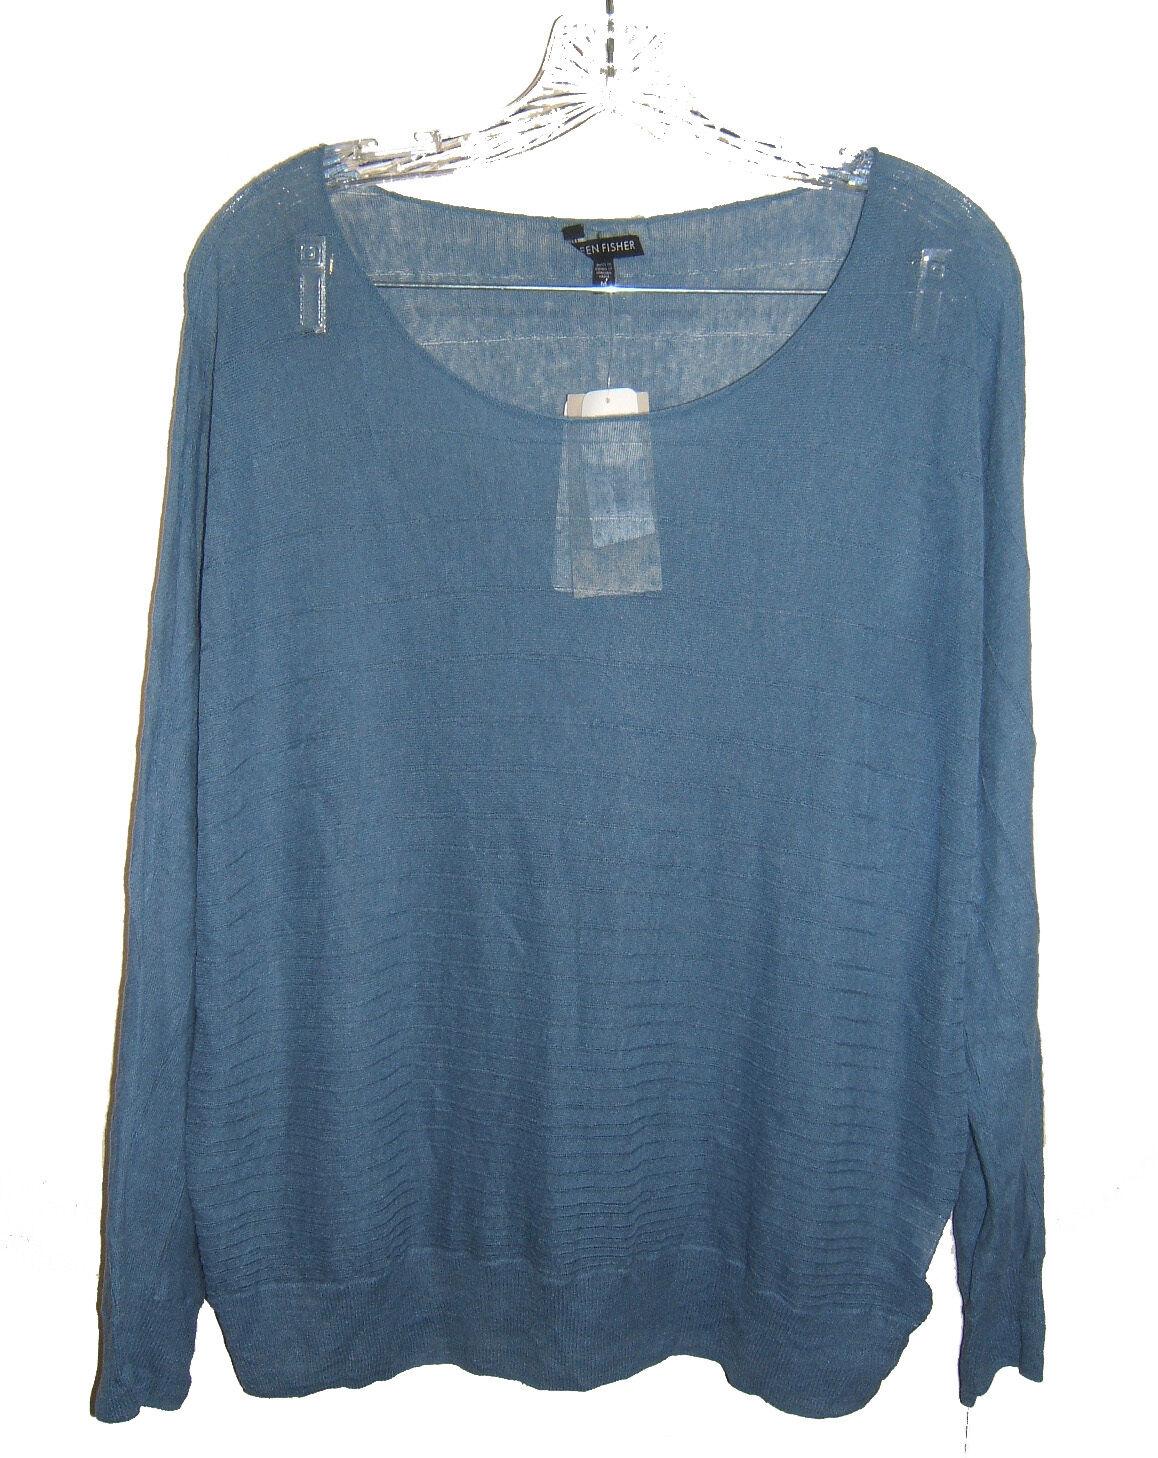 NEW Eileen Fisher bluee Sheer Hemp Sweater M NWT Dolman Sleeves